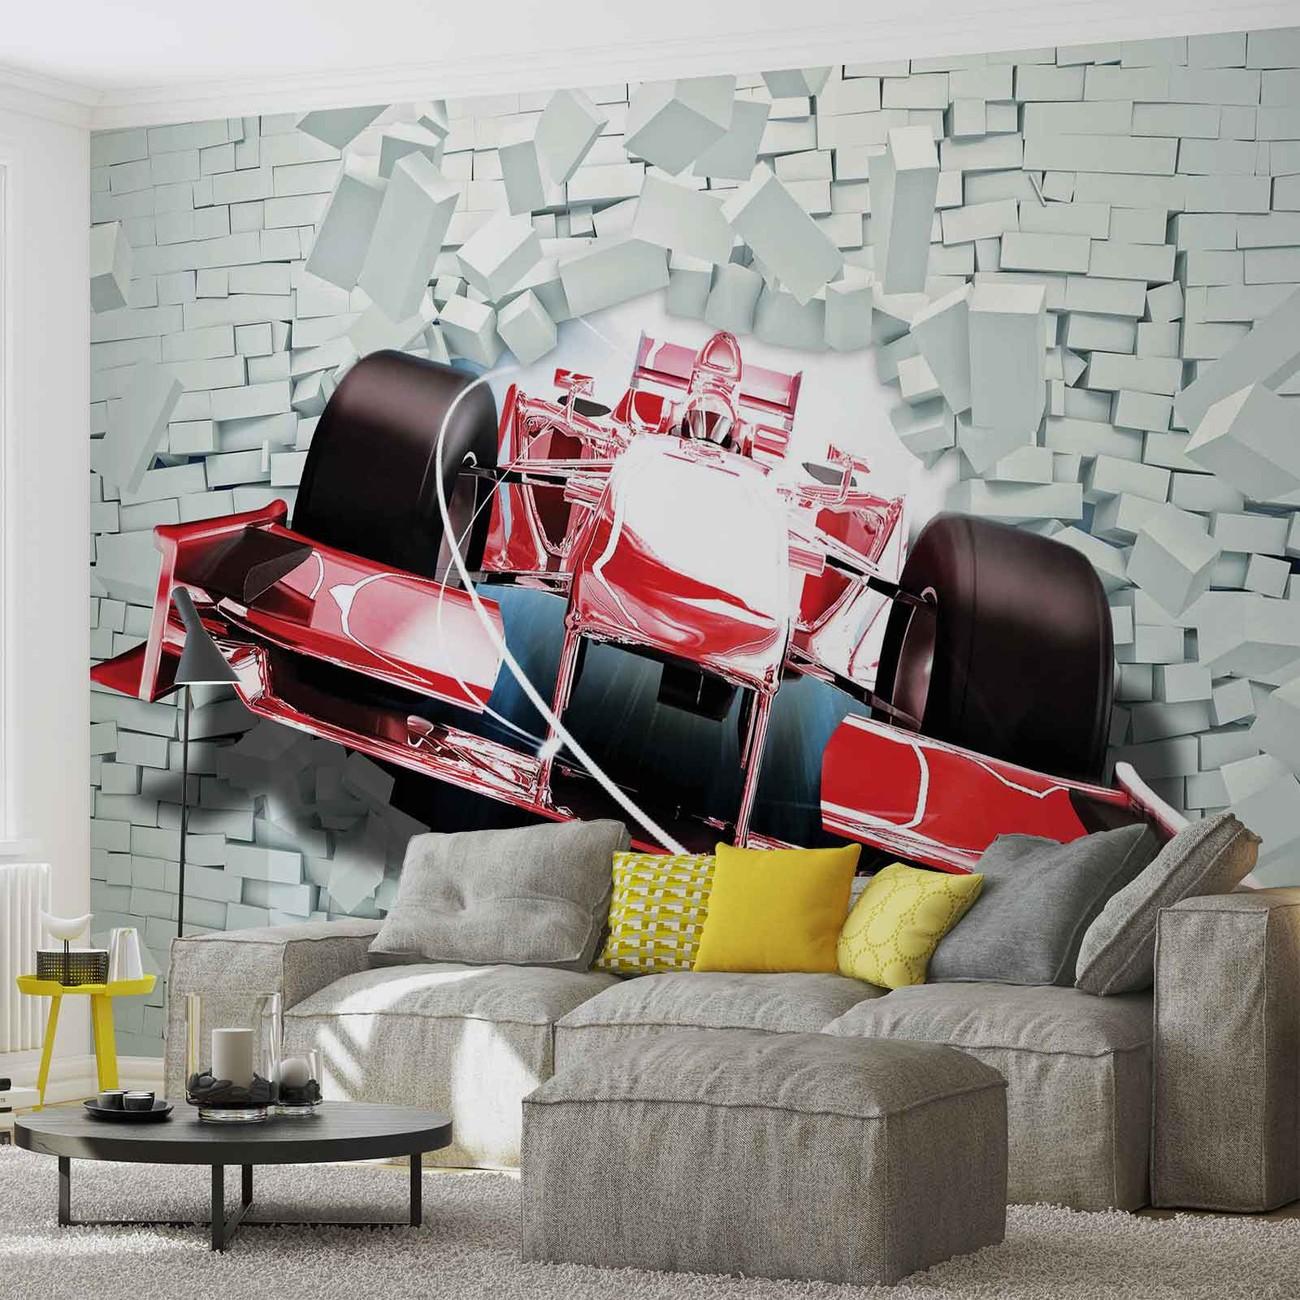 Formula 1 racing car bricks wall paper mural buy at for Cars movie wall mural